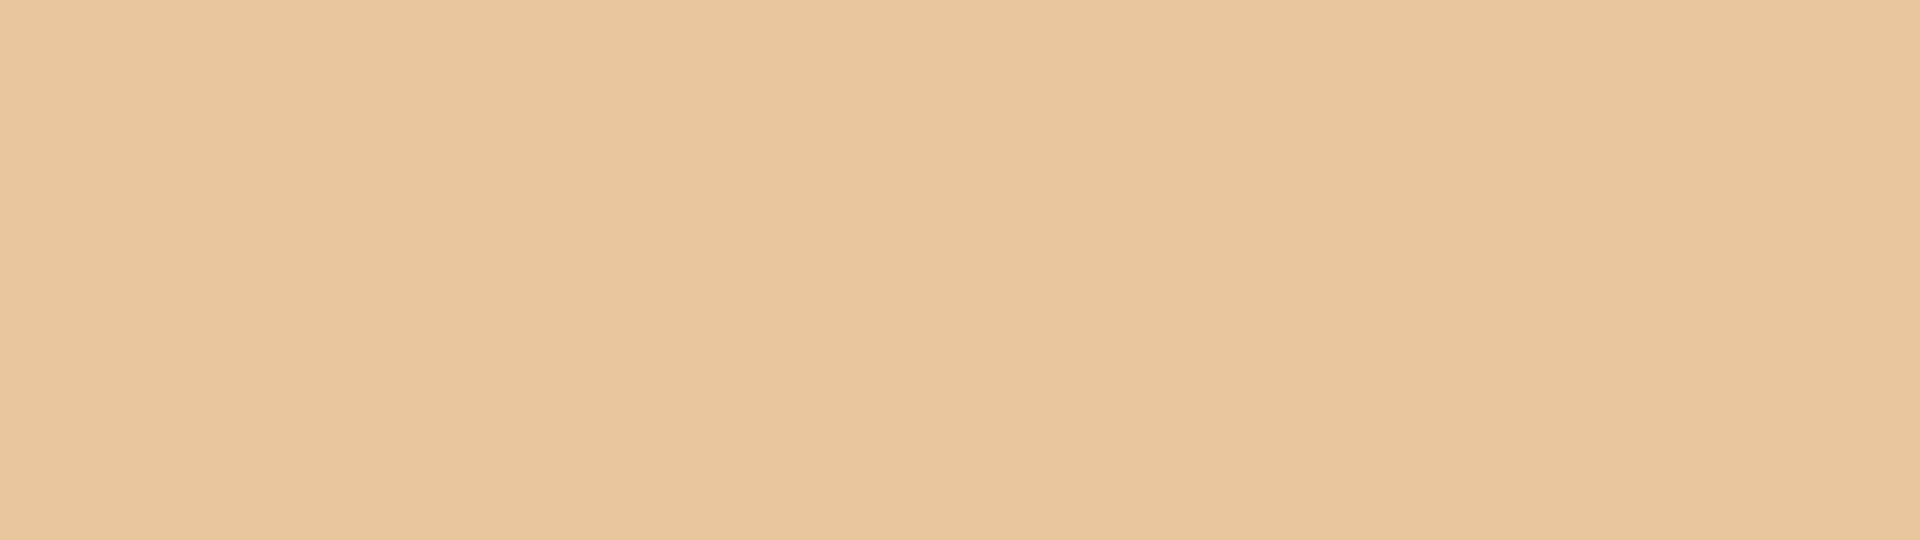 CATEGORY-KOZM-HAFTAYAGUZELBIRBASLANGIC-20-01